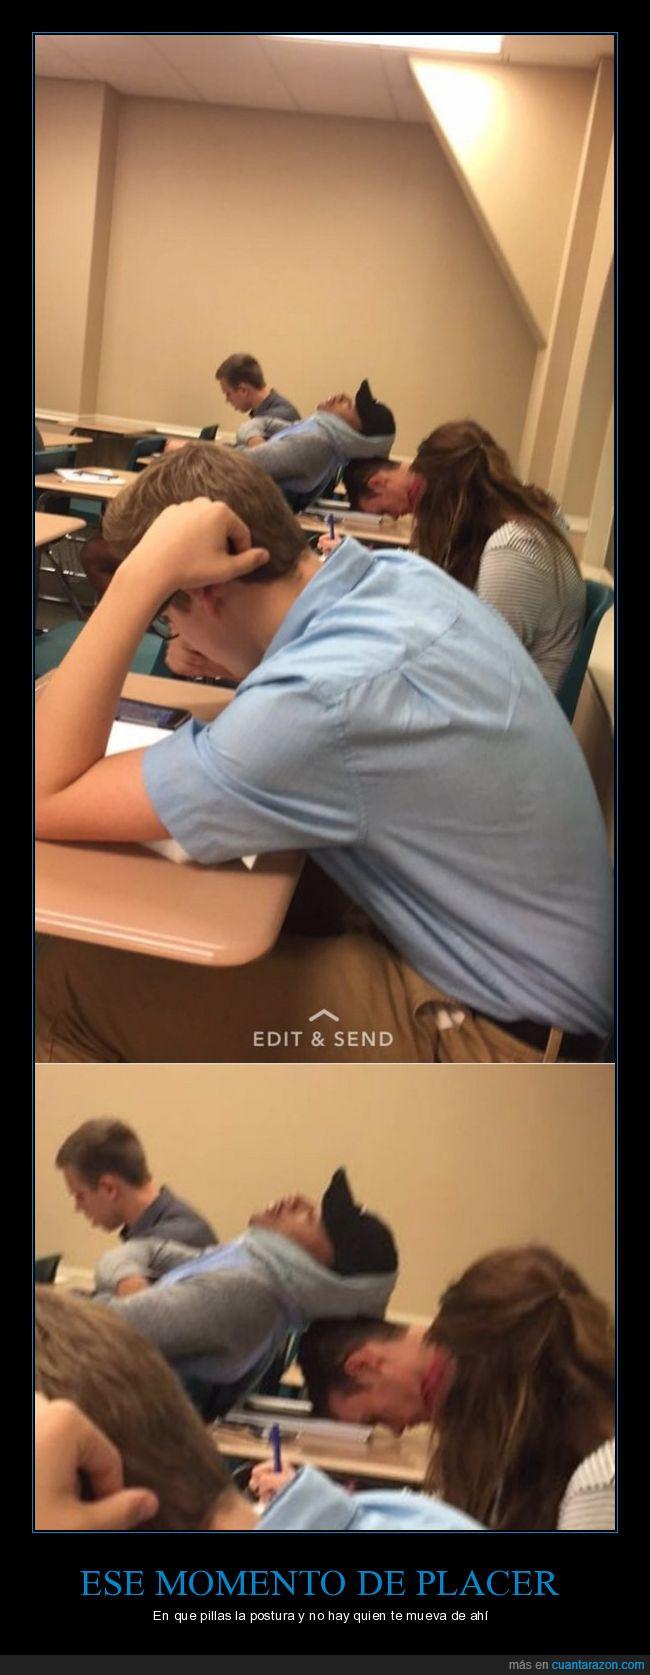 clase,dormidos,East Texas Baptist University,postura,universidad,vagos